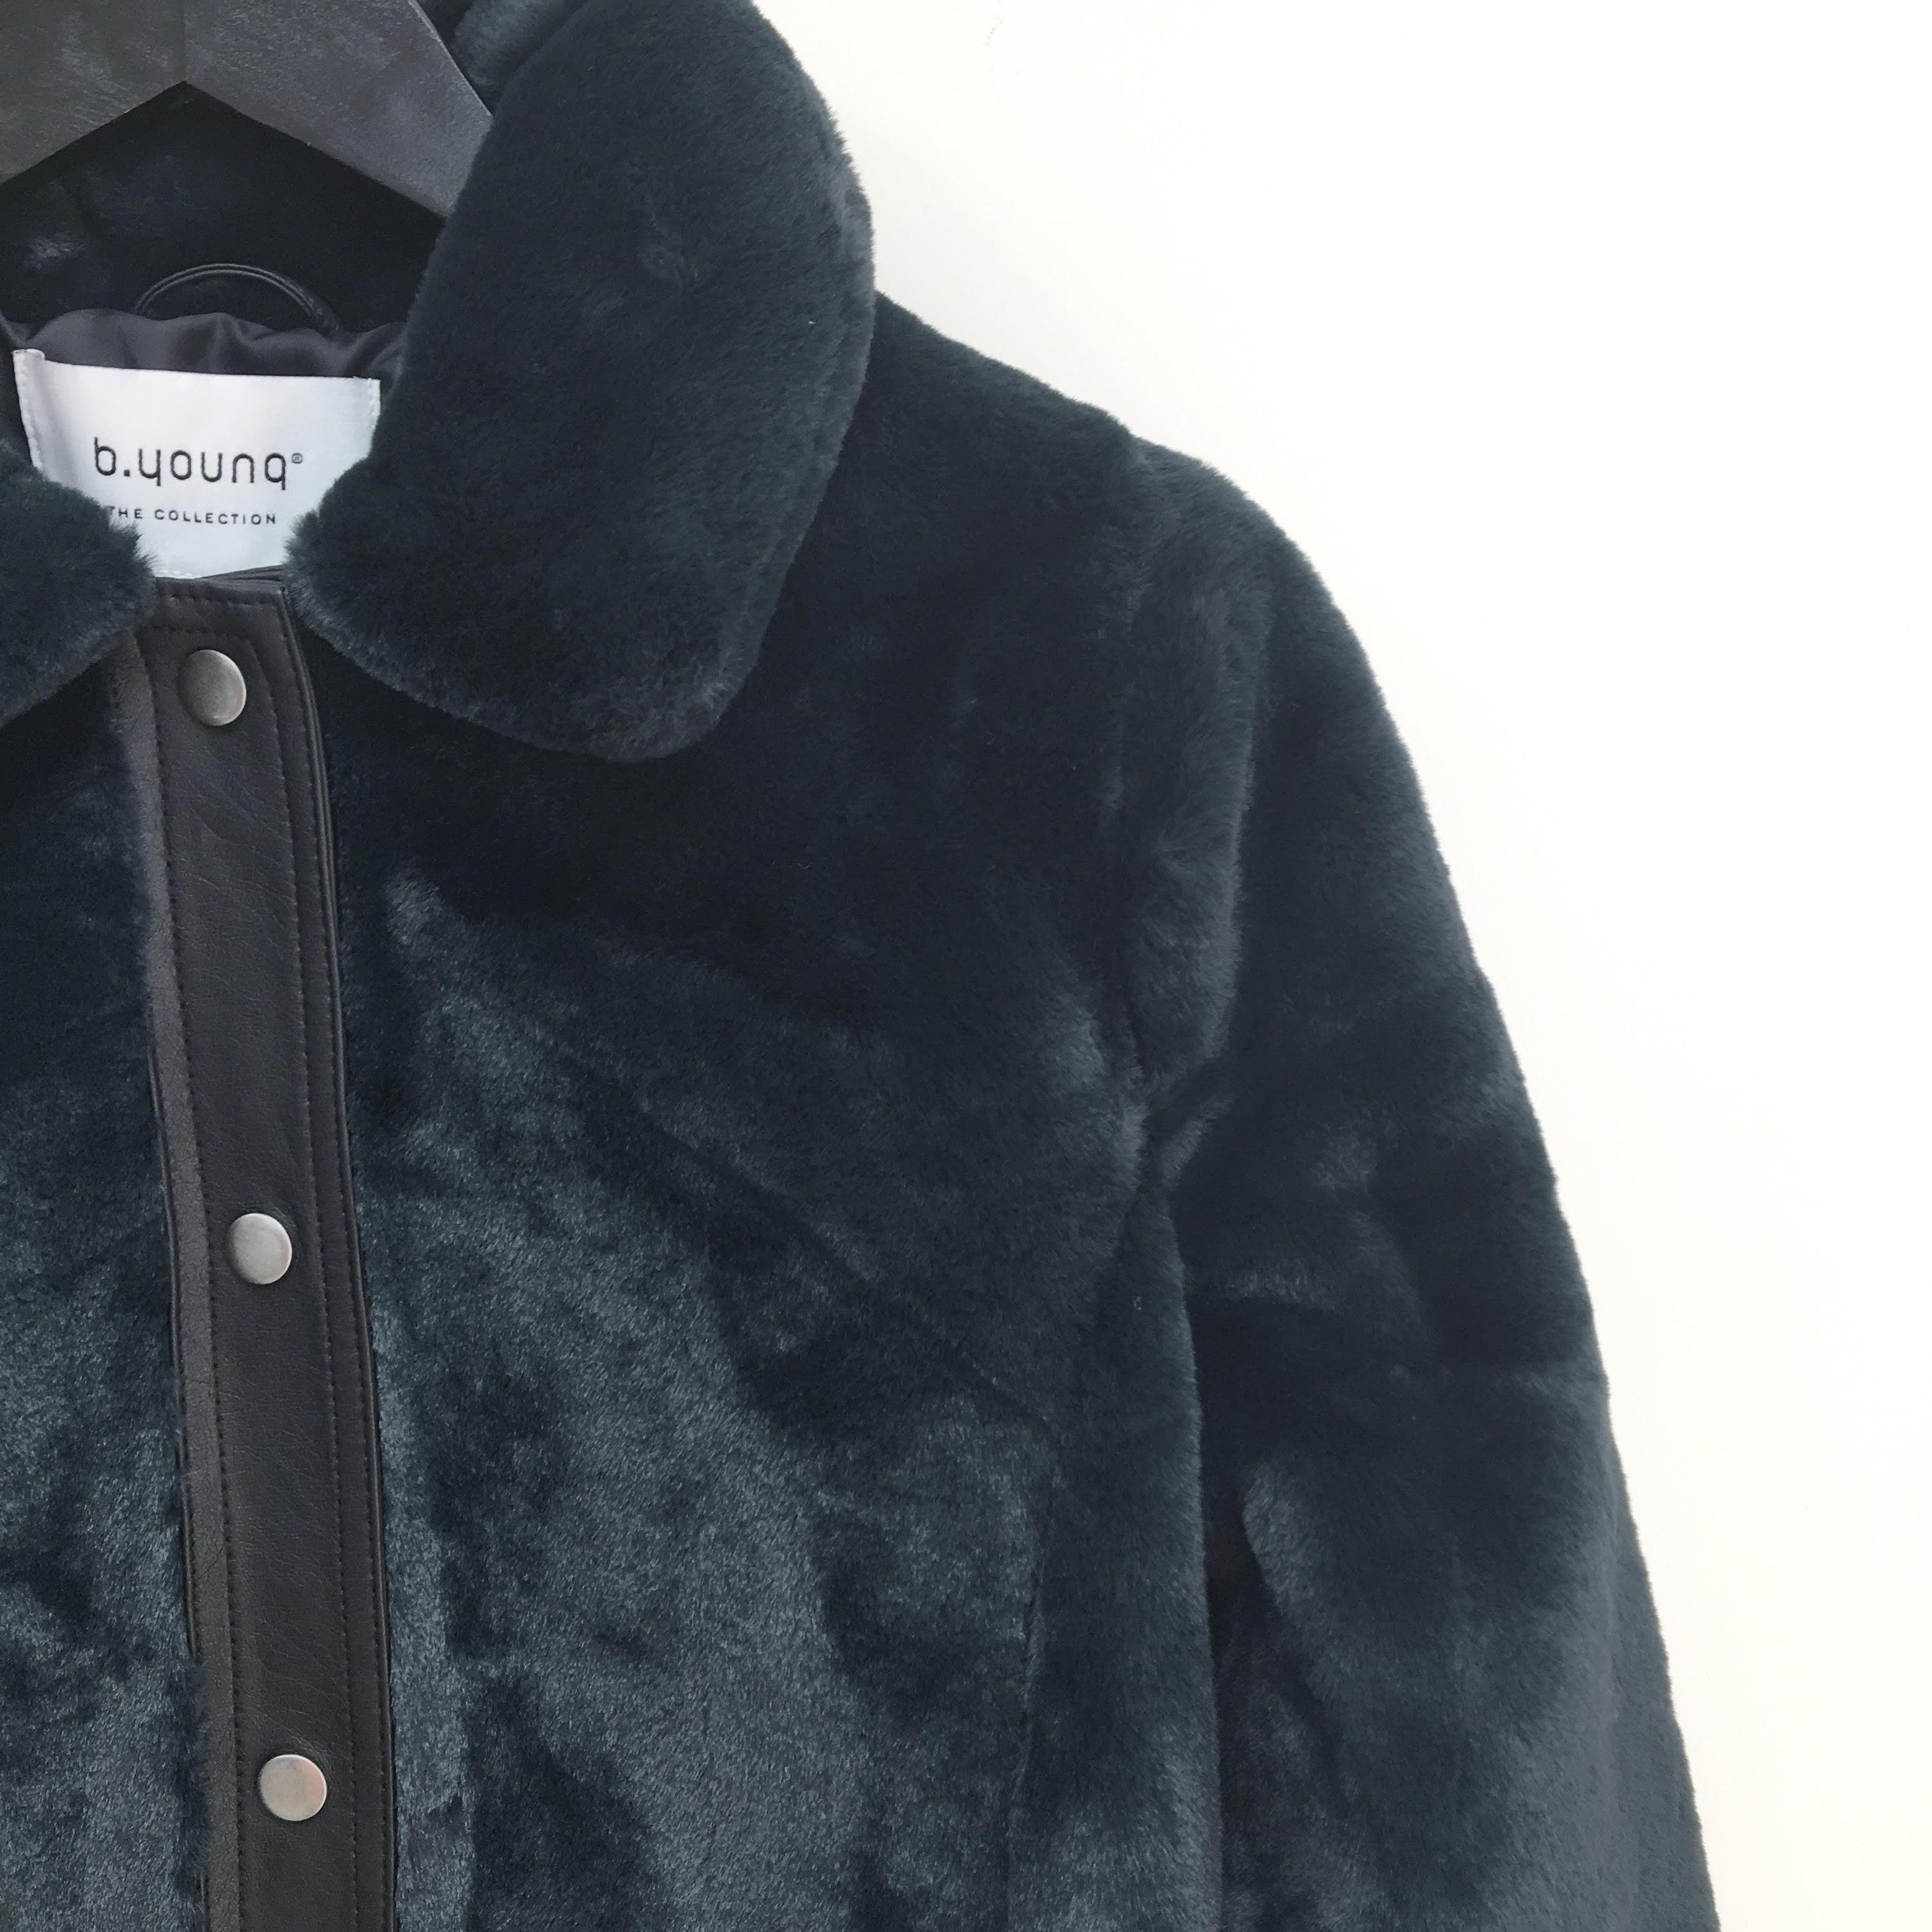 SALE Belina Jacket was £69.99